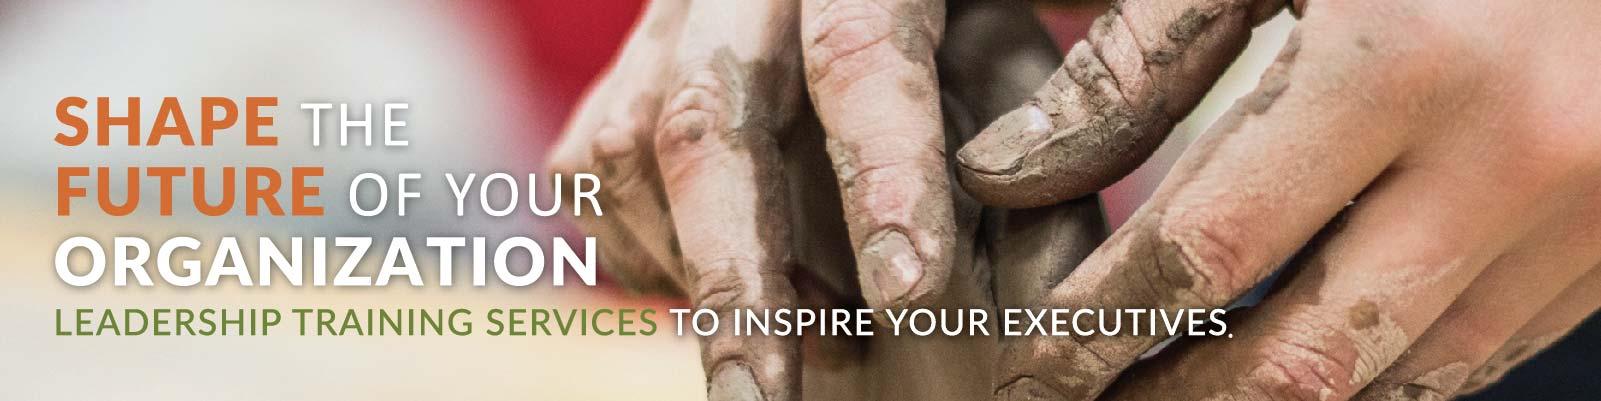 CATMEDIA Leadership Training Shape the future of your organization